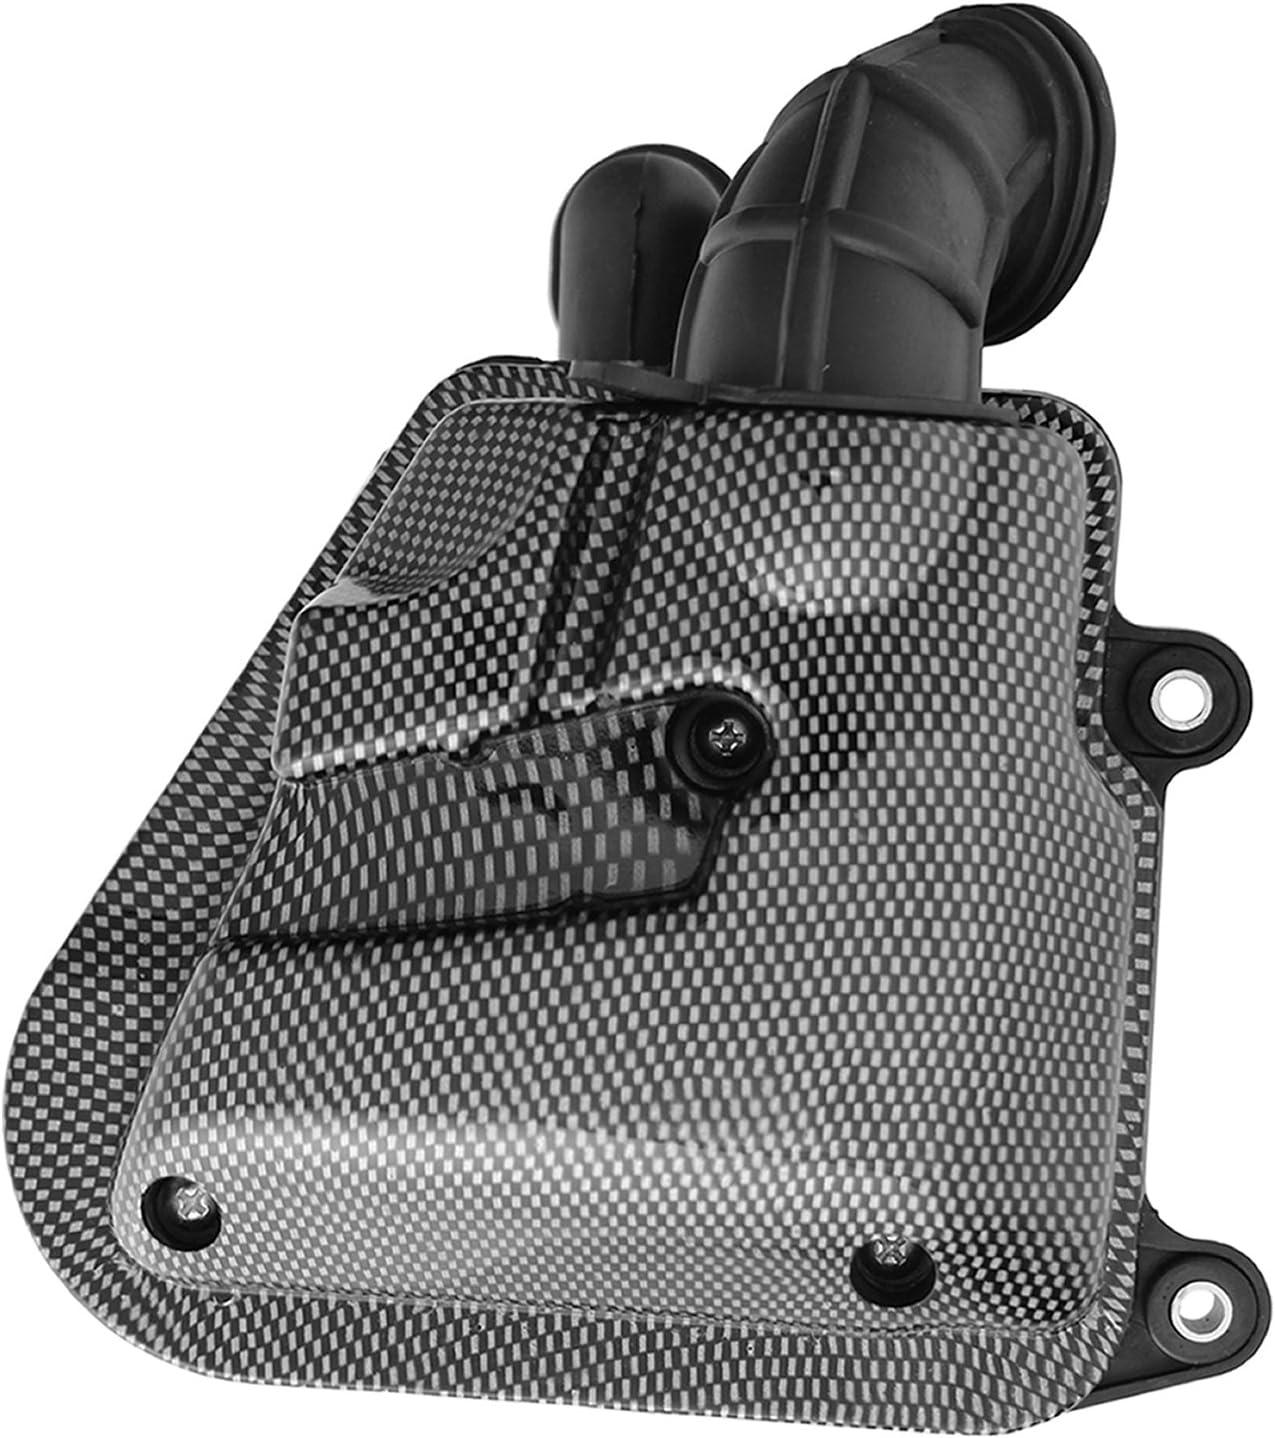 cassetta filtro aria per Malaguti F10/JET LINE 50/ Filtro aria Carbon Ciak 50 99 04//–/07 F12/Phantom 50/AC